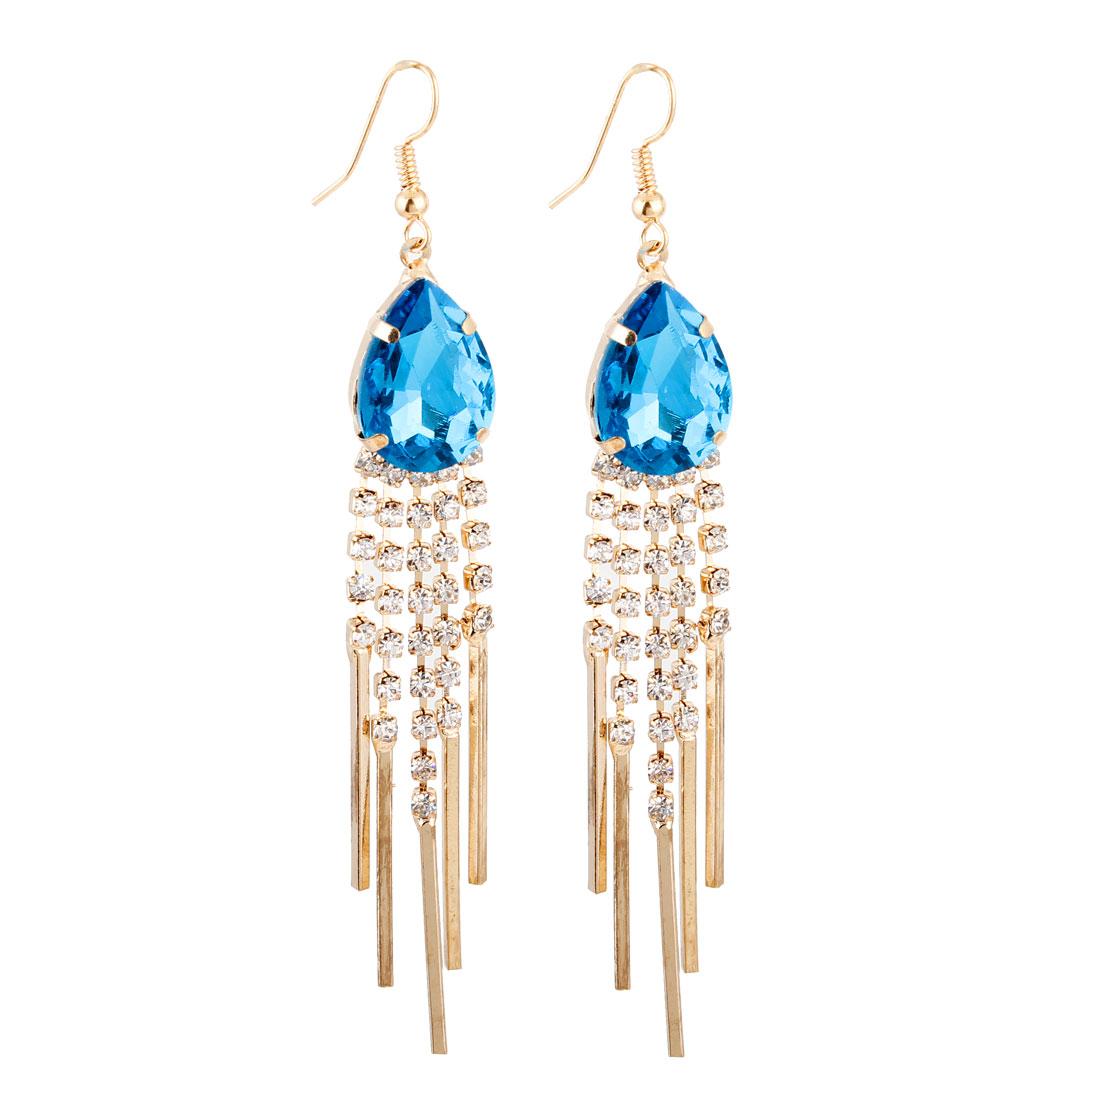 Pair Blue Faux Rhinestone Detail Dangle Hook Earrings for Lady